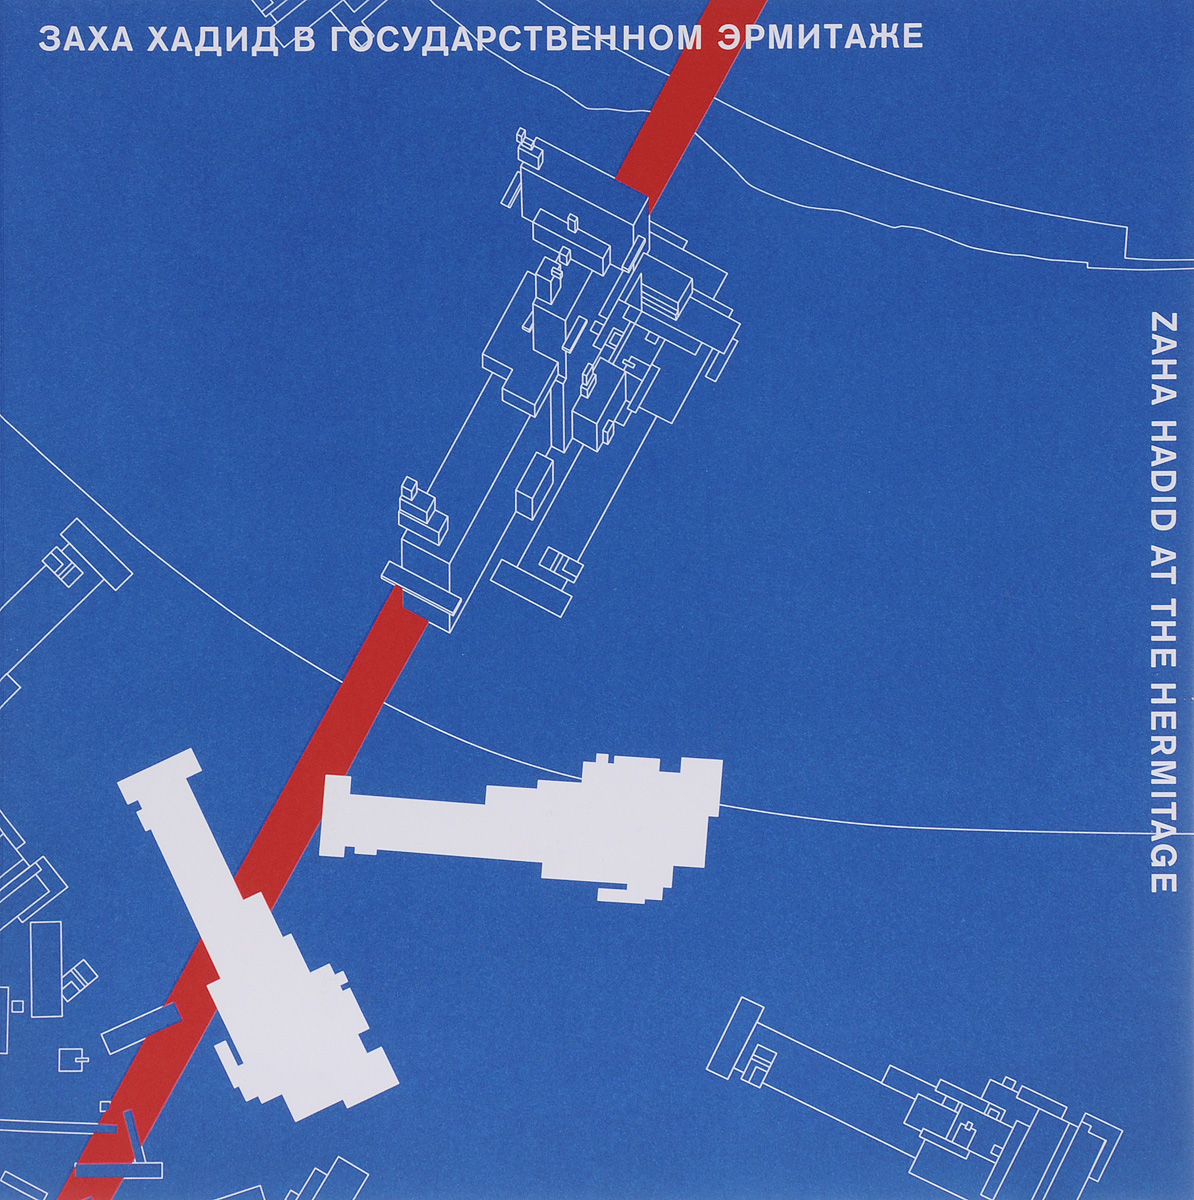 Заха Хадид в Государственном Эрмитаже. Каталог / Zaha Hadid at the Hermitage: Catalogue насос sks supershort 10367sks